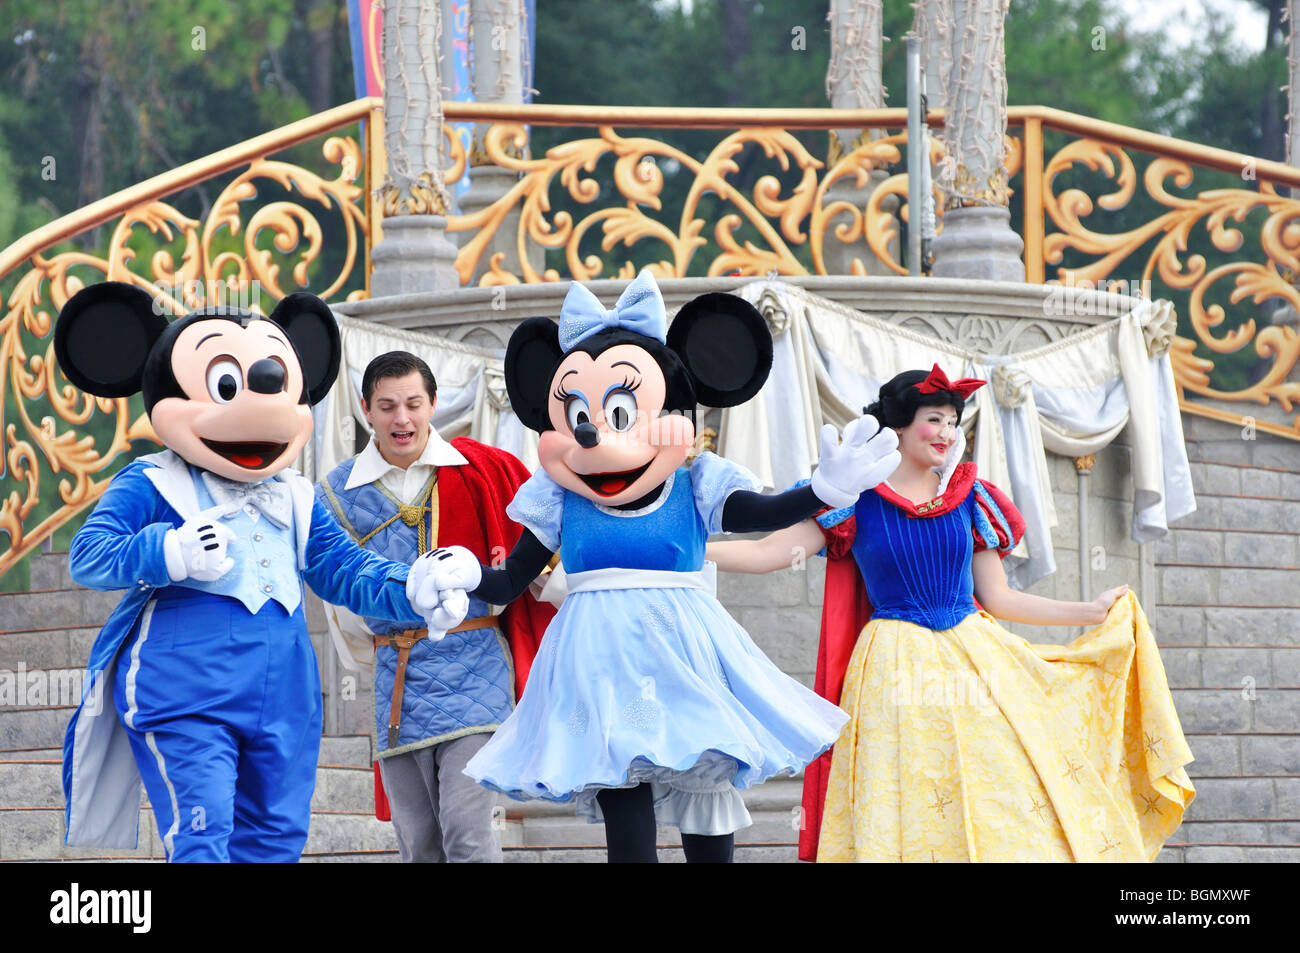 Disneyworld, Orlando, Florida, USA Stock Photo